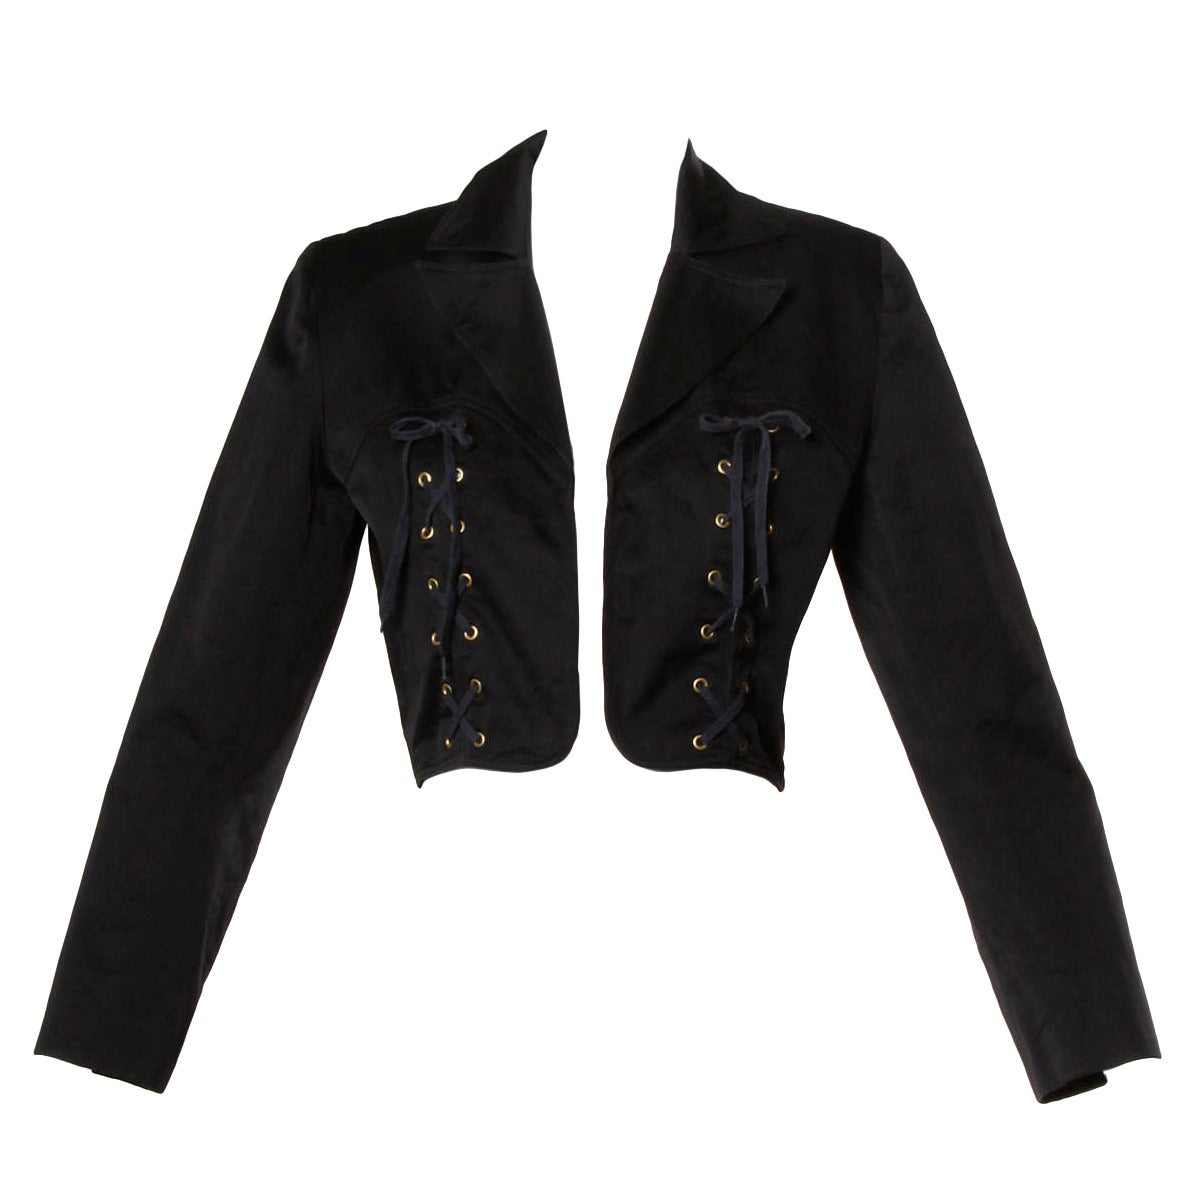 Patrick Kelly Vintage Black Lace Up Grommet Jacket 1